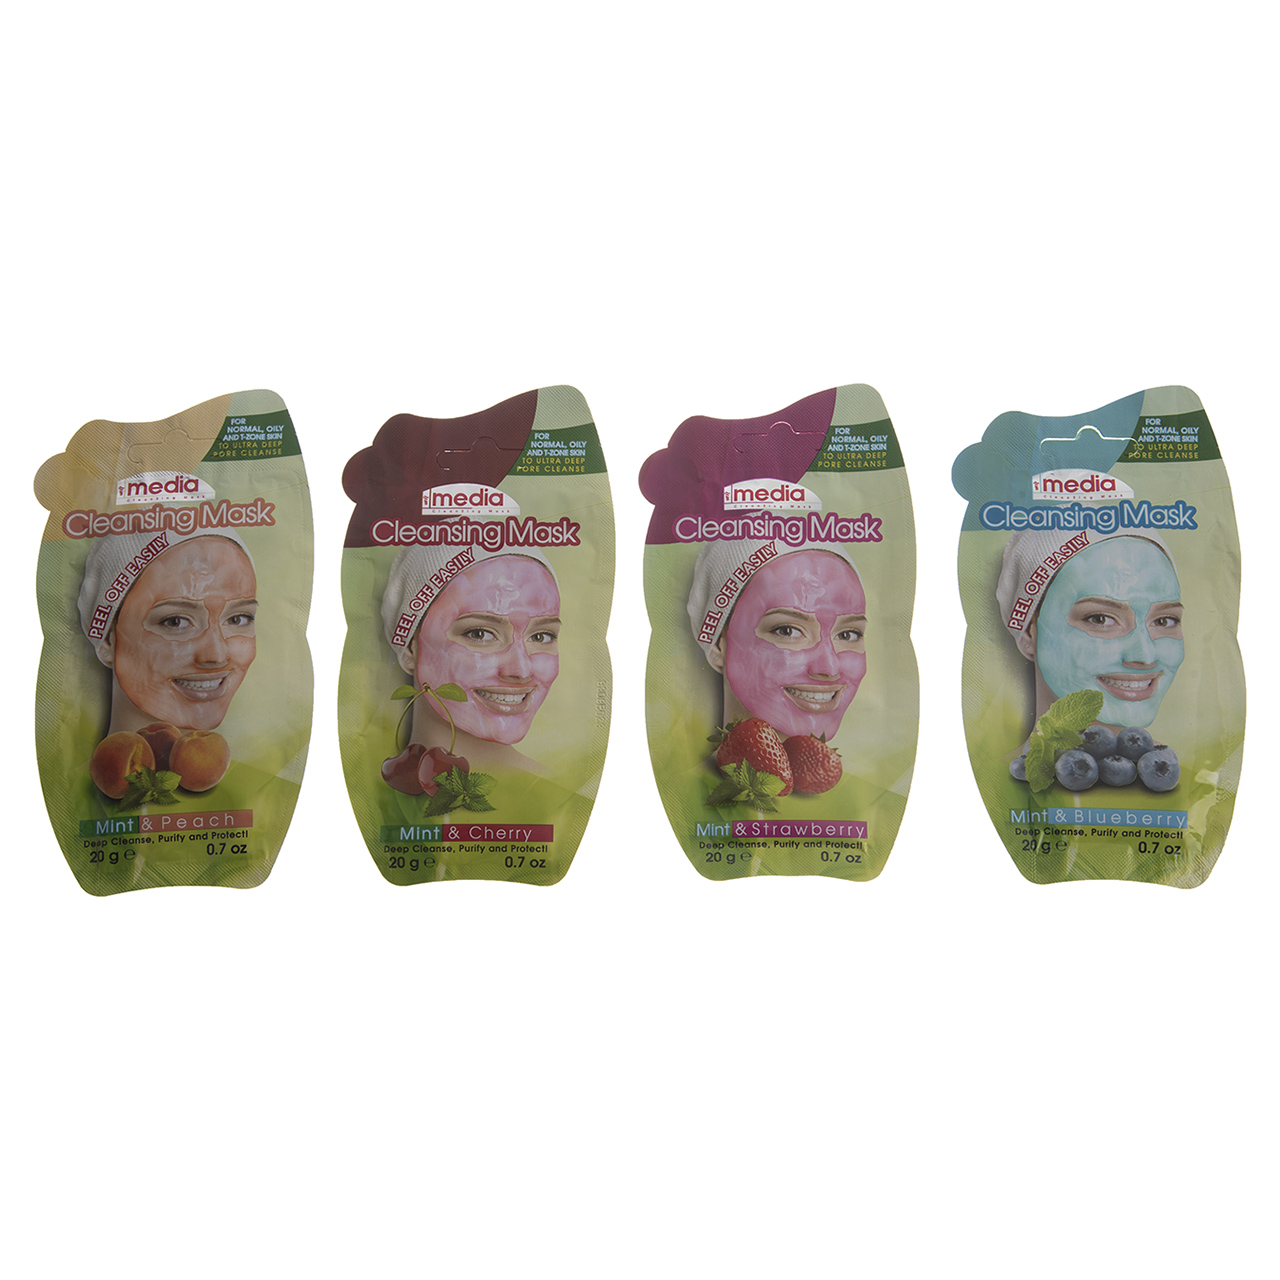 قیمت ماسک صورت مدیا مدل Peel Of Easily بسته 4 عددی